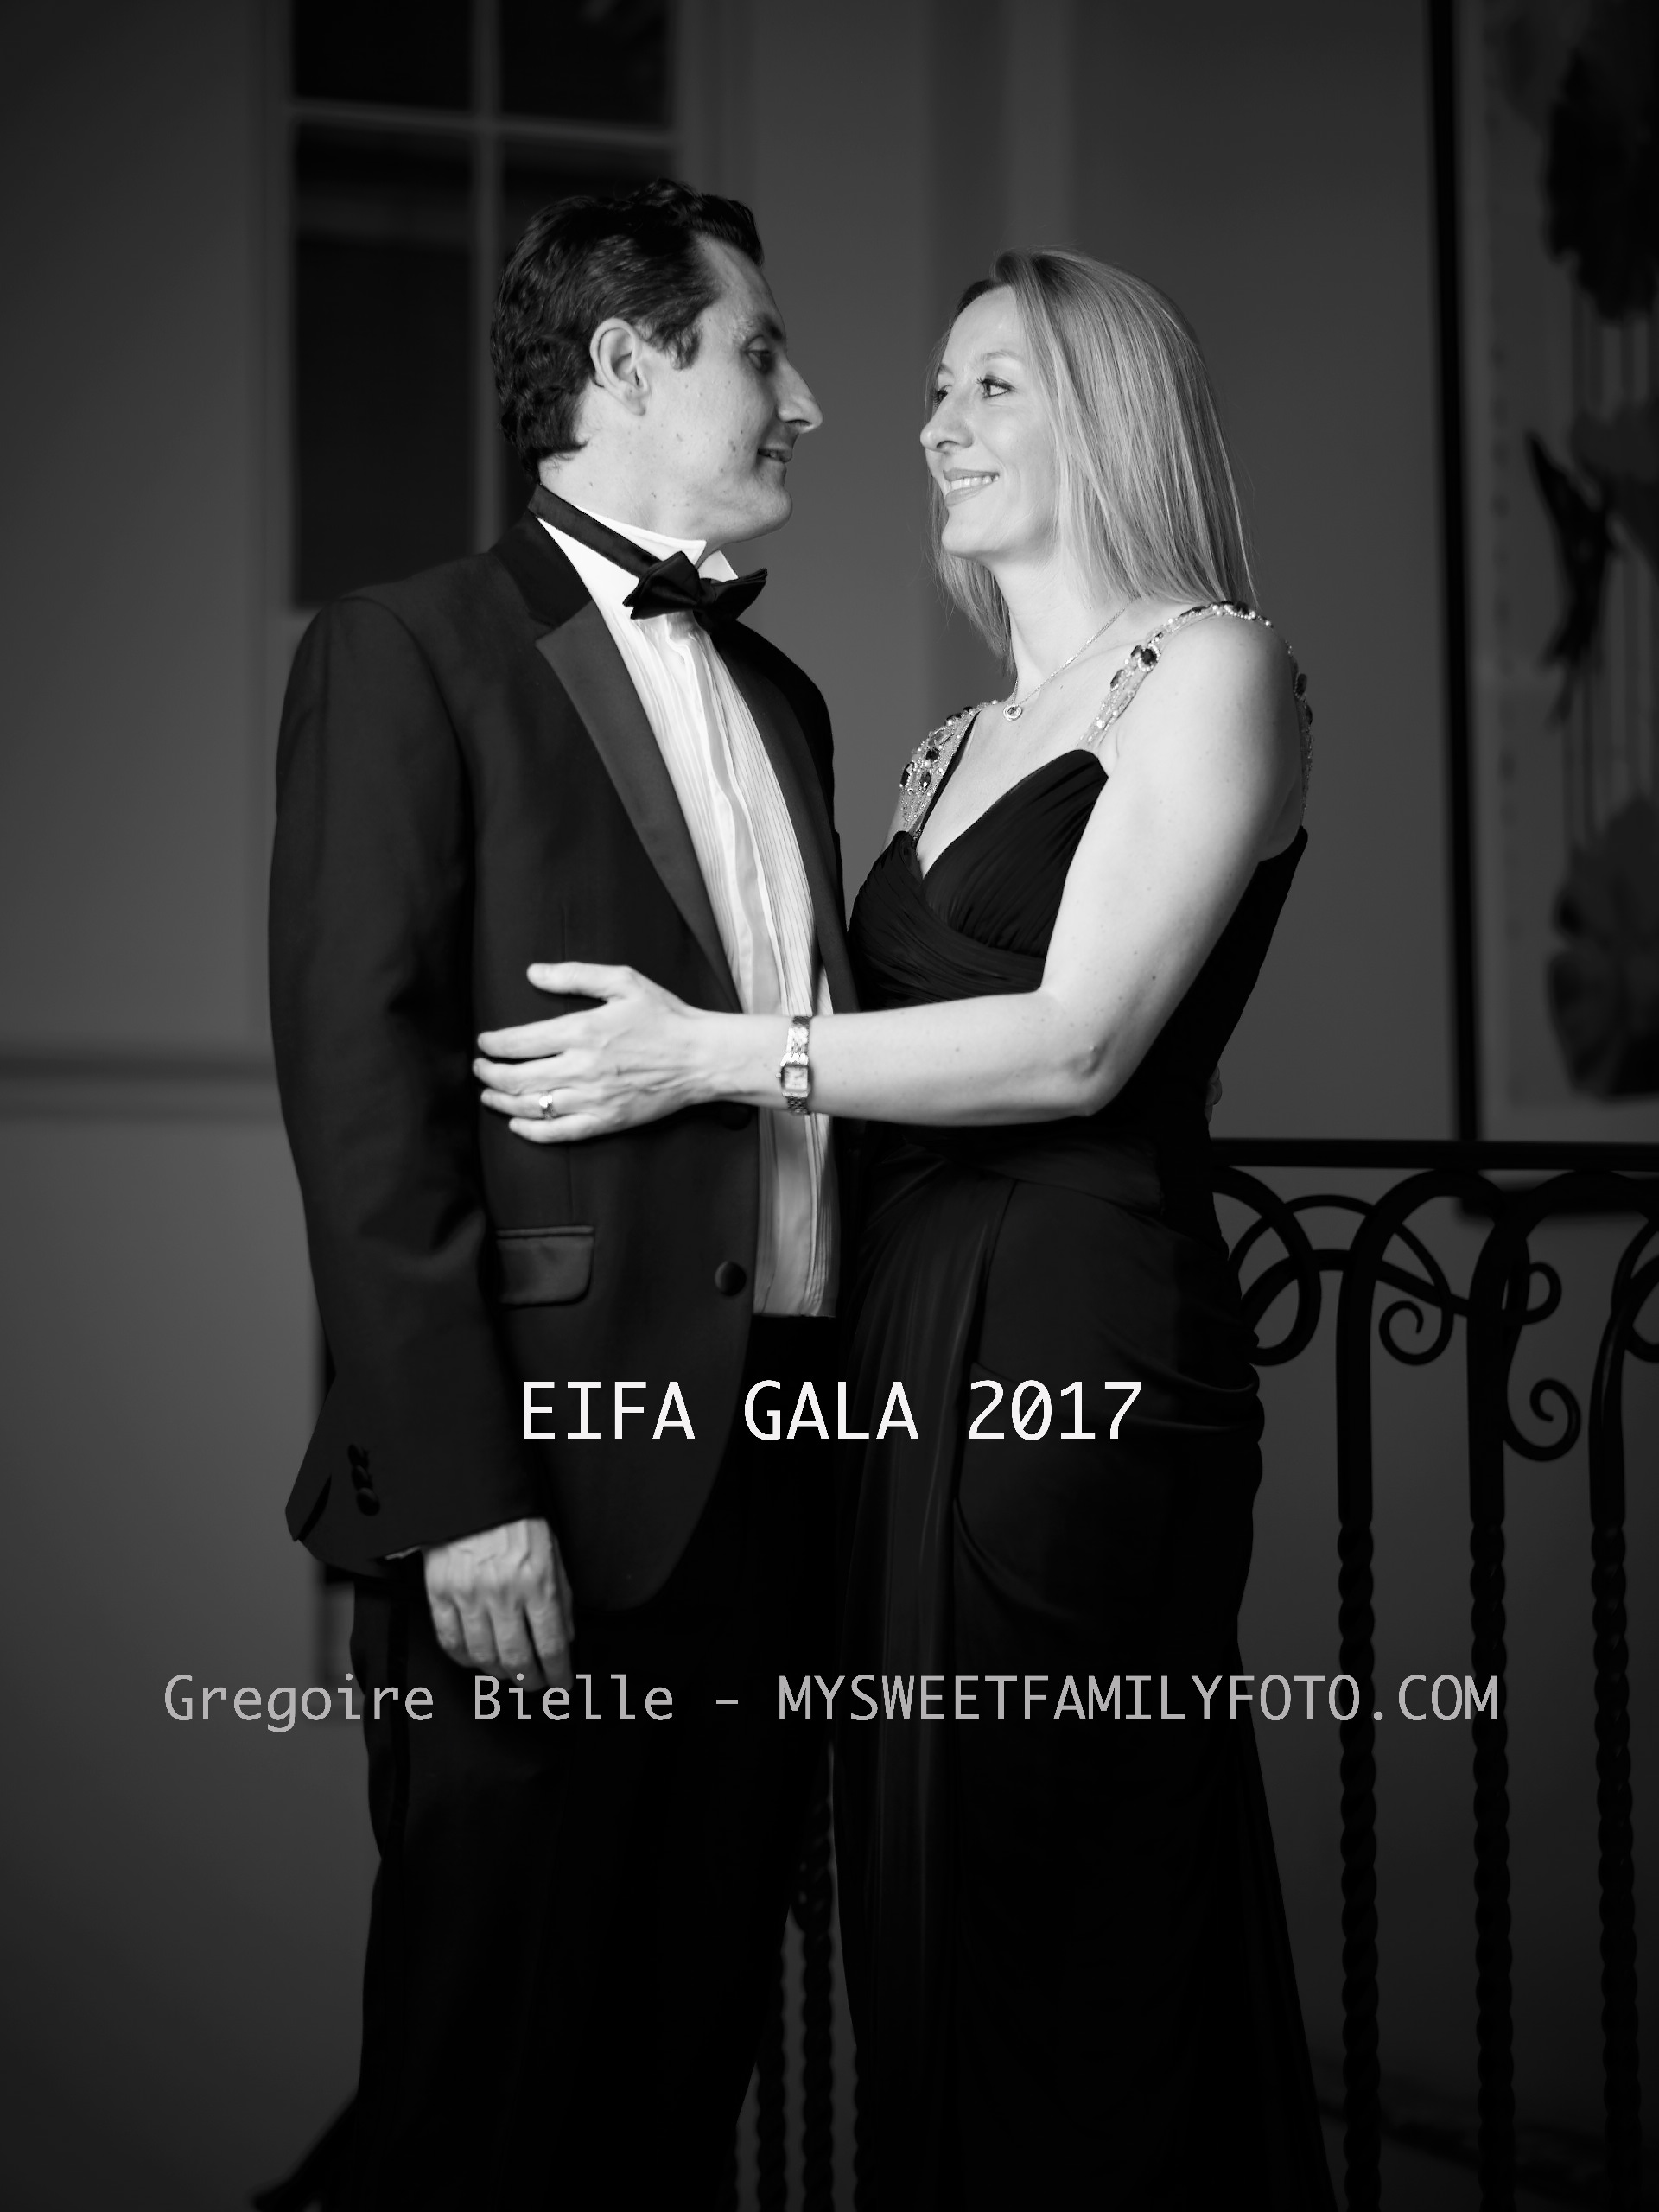 EIFA GALA 1148.jpg